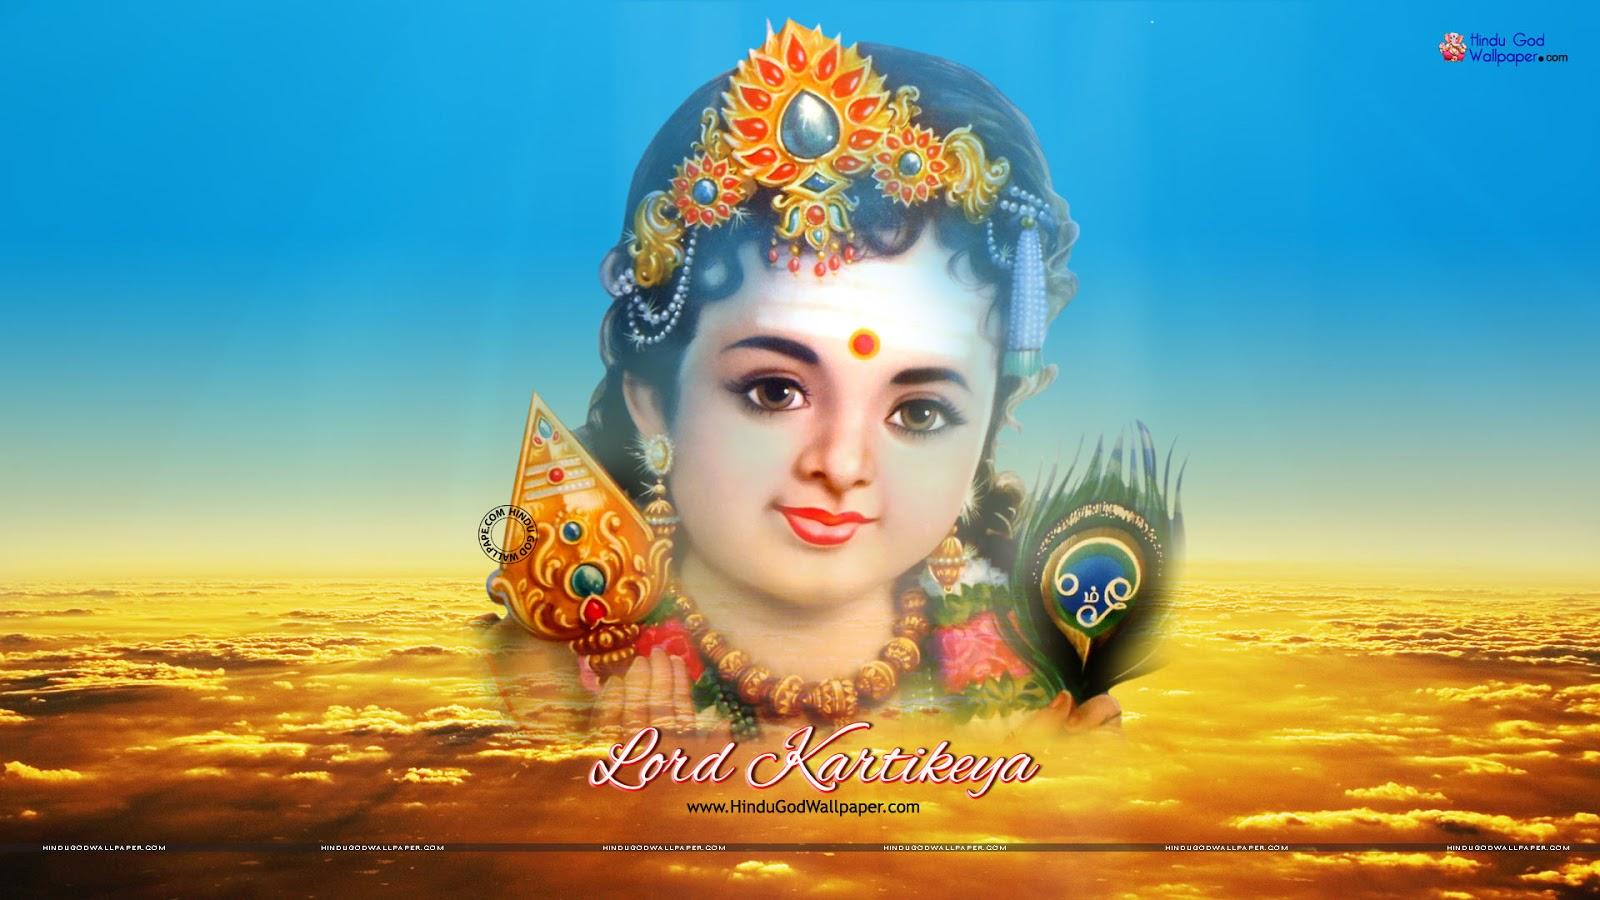 Lord Kartikeya God Wallpapers